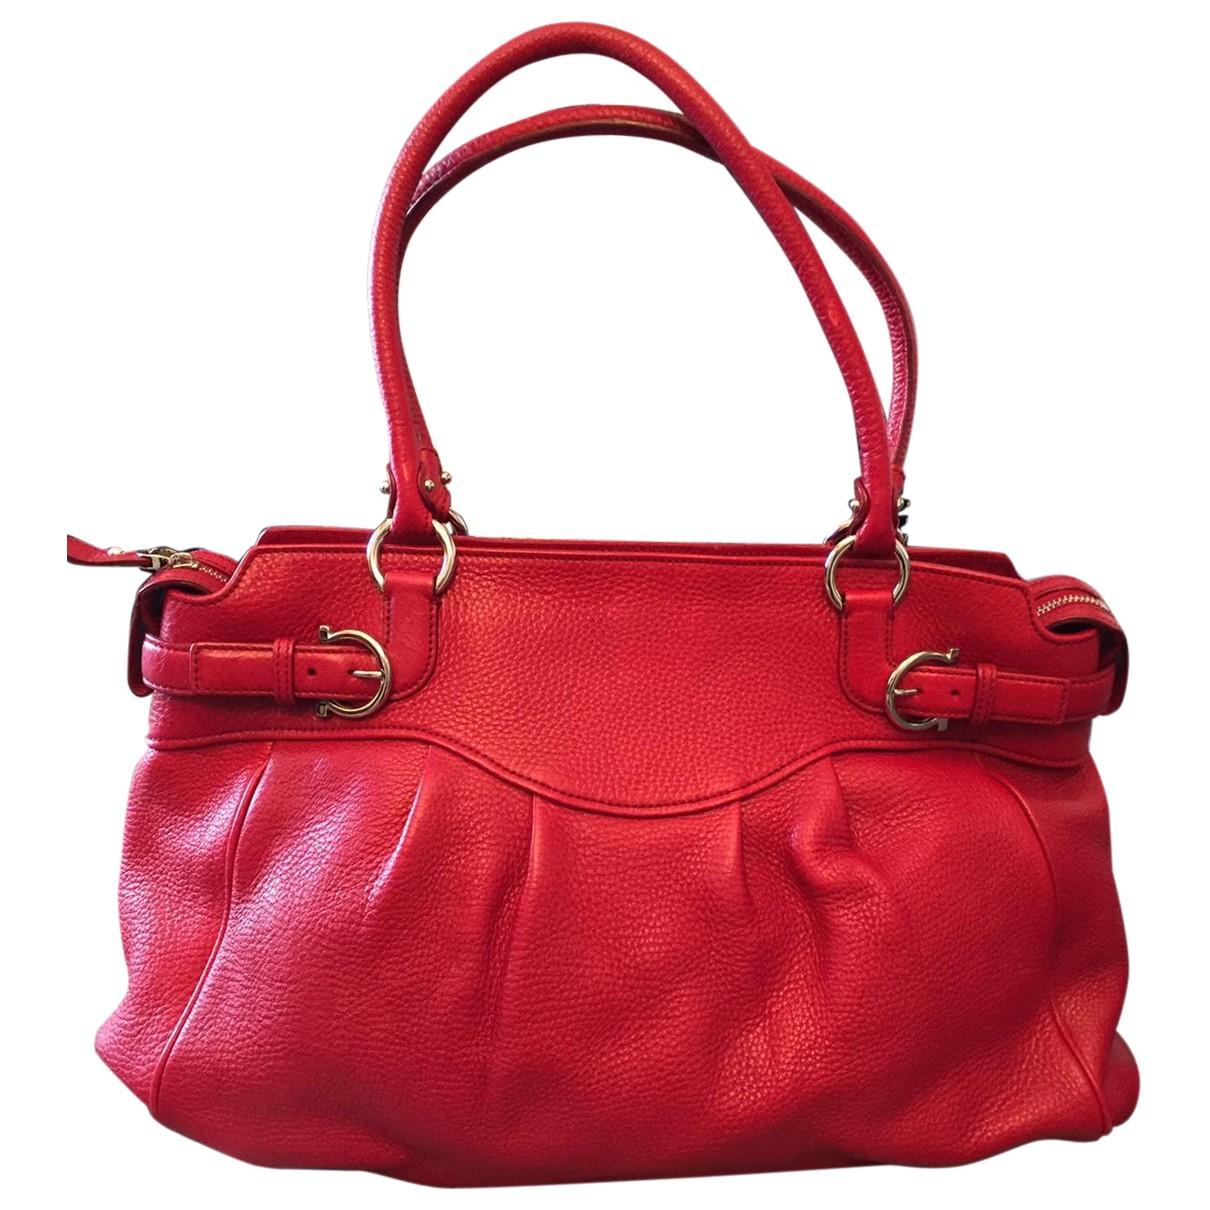 Salvatore Ferragamo N Red Leather handbag for Women N